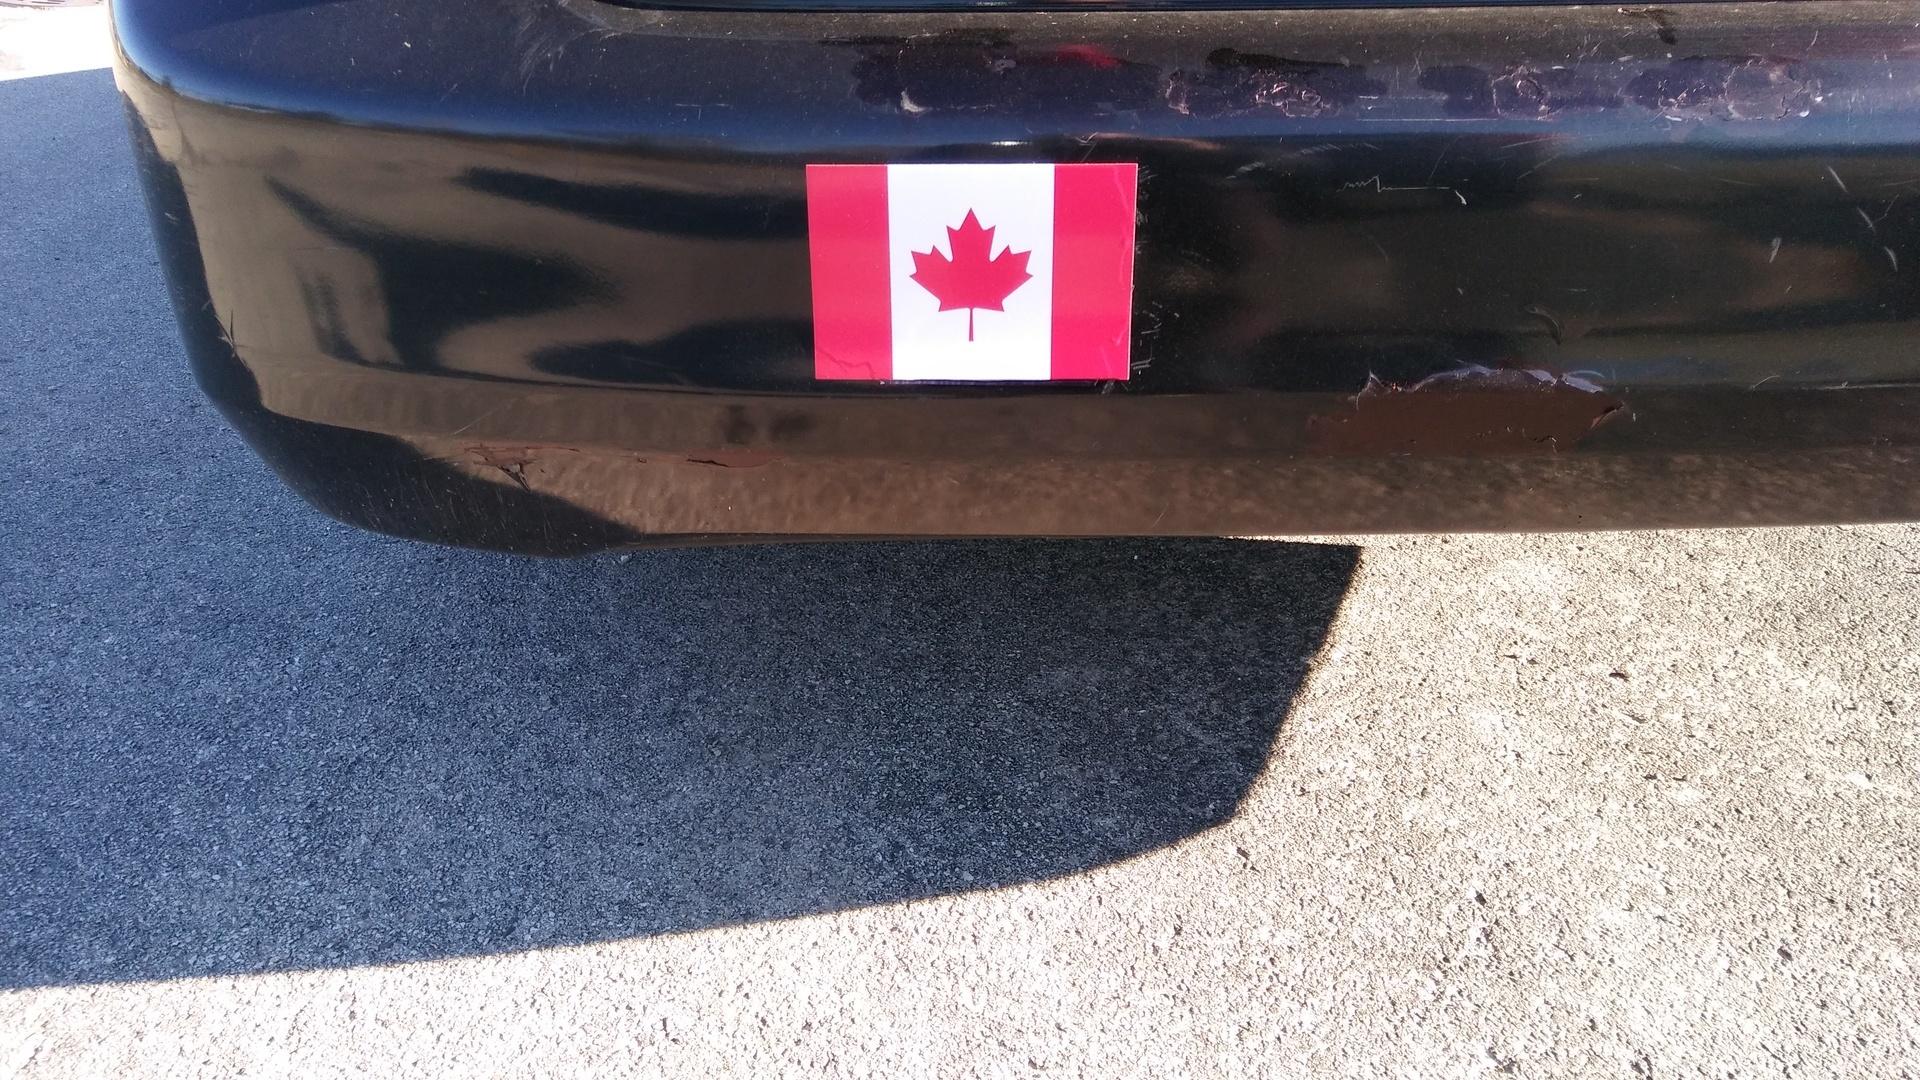 Tom's photograph of their Canada Flag Sticker